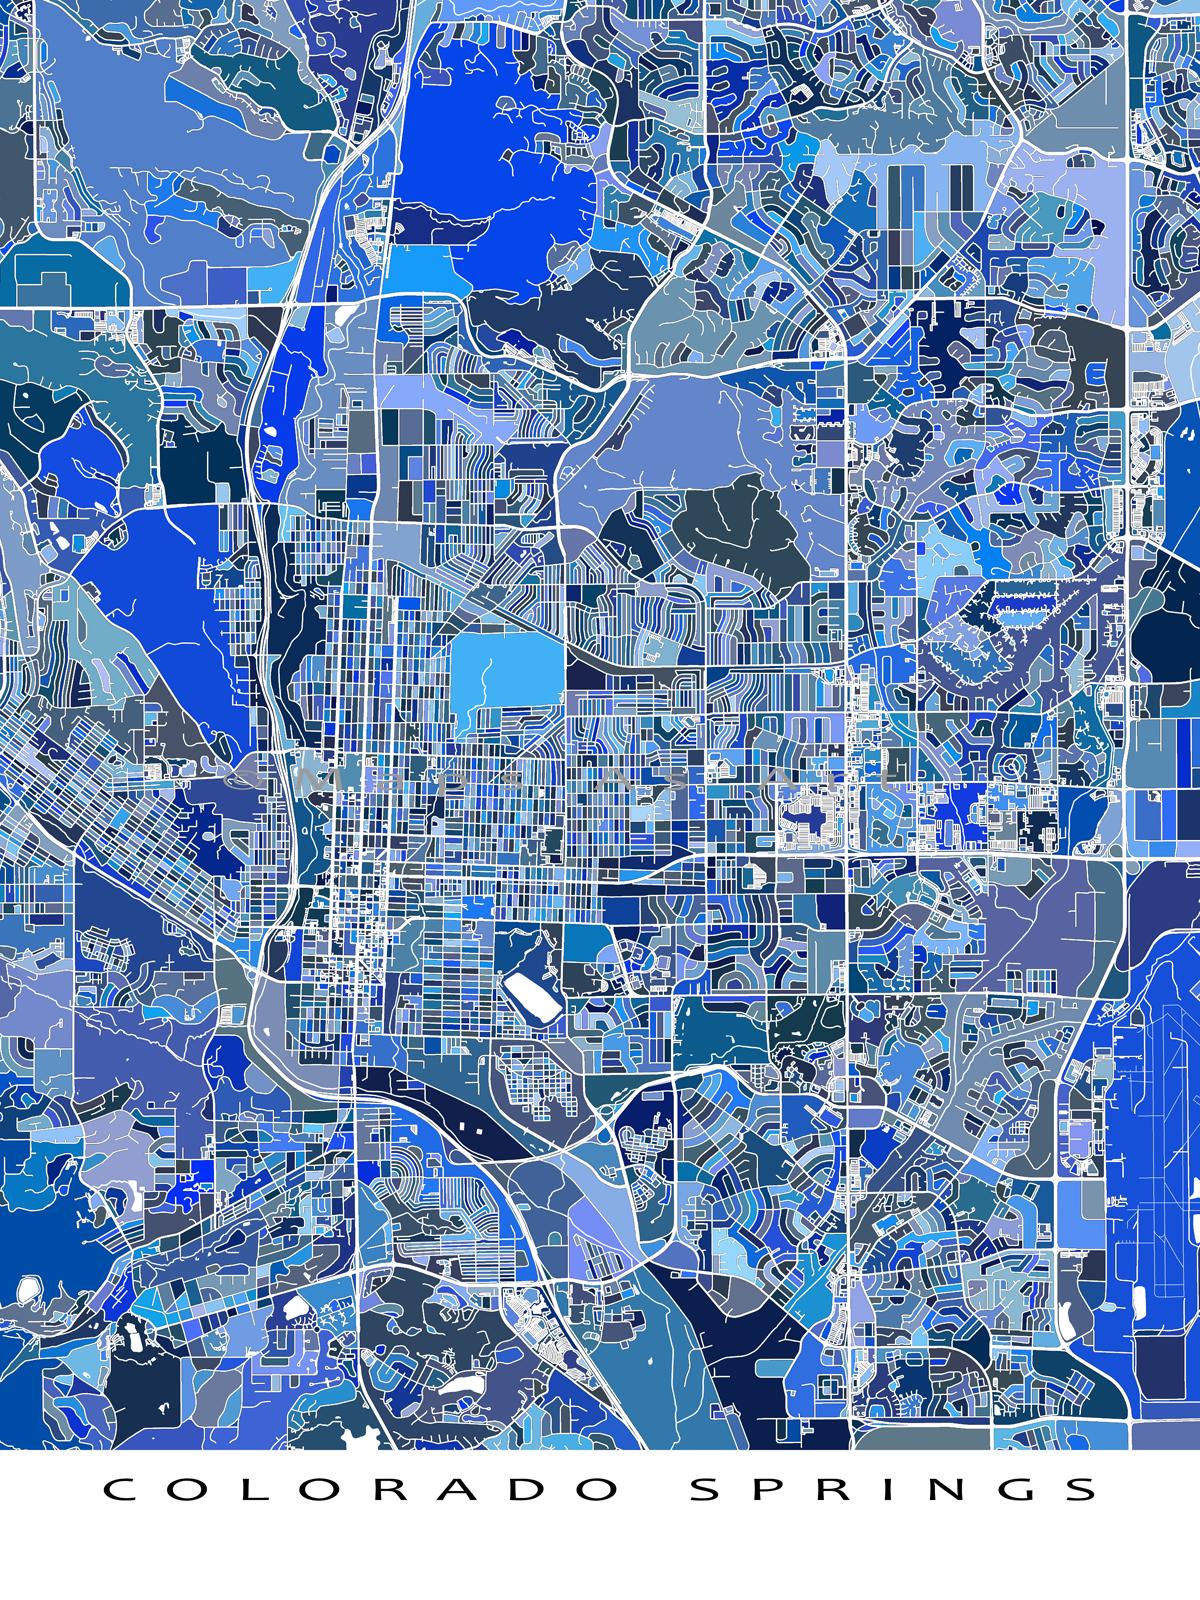 Color printing colorado springs - Do You Love Colorado Springs Colorado Then This Colorado Springs Map Print